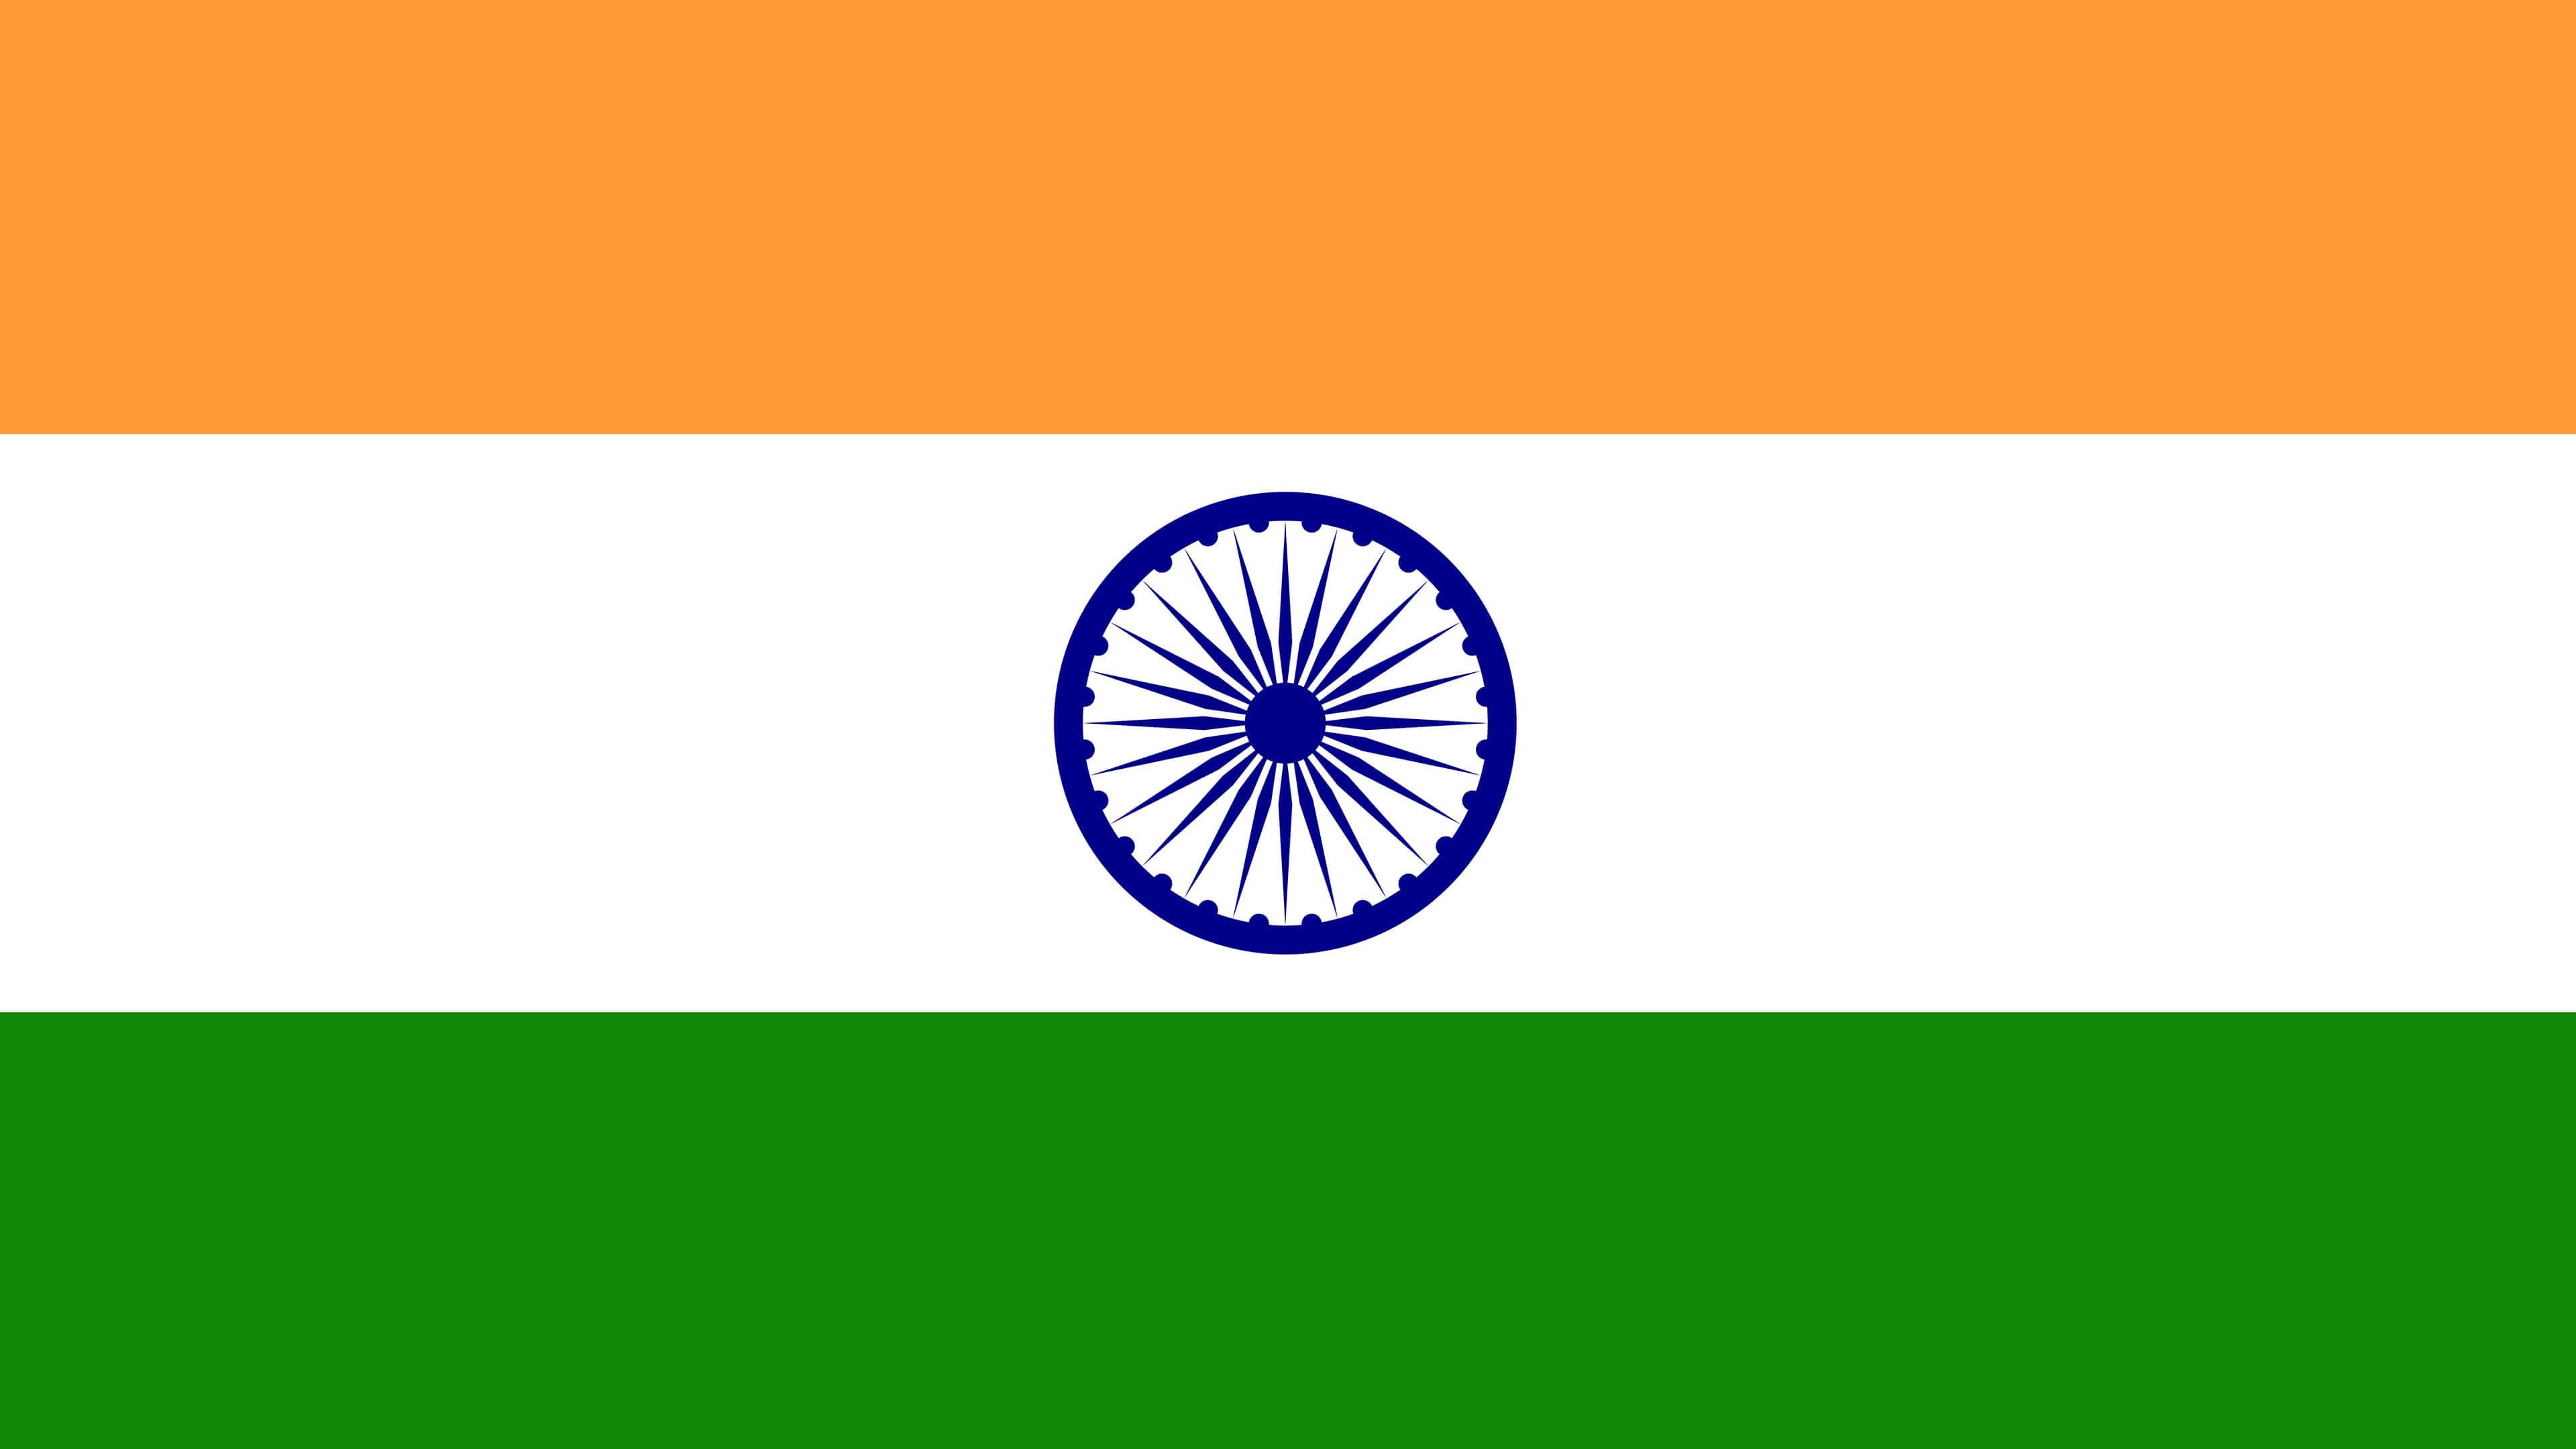 india flag uhd 4k wallpaper